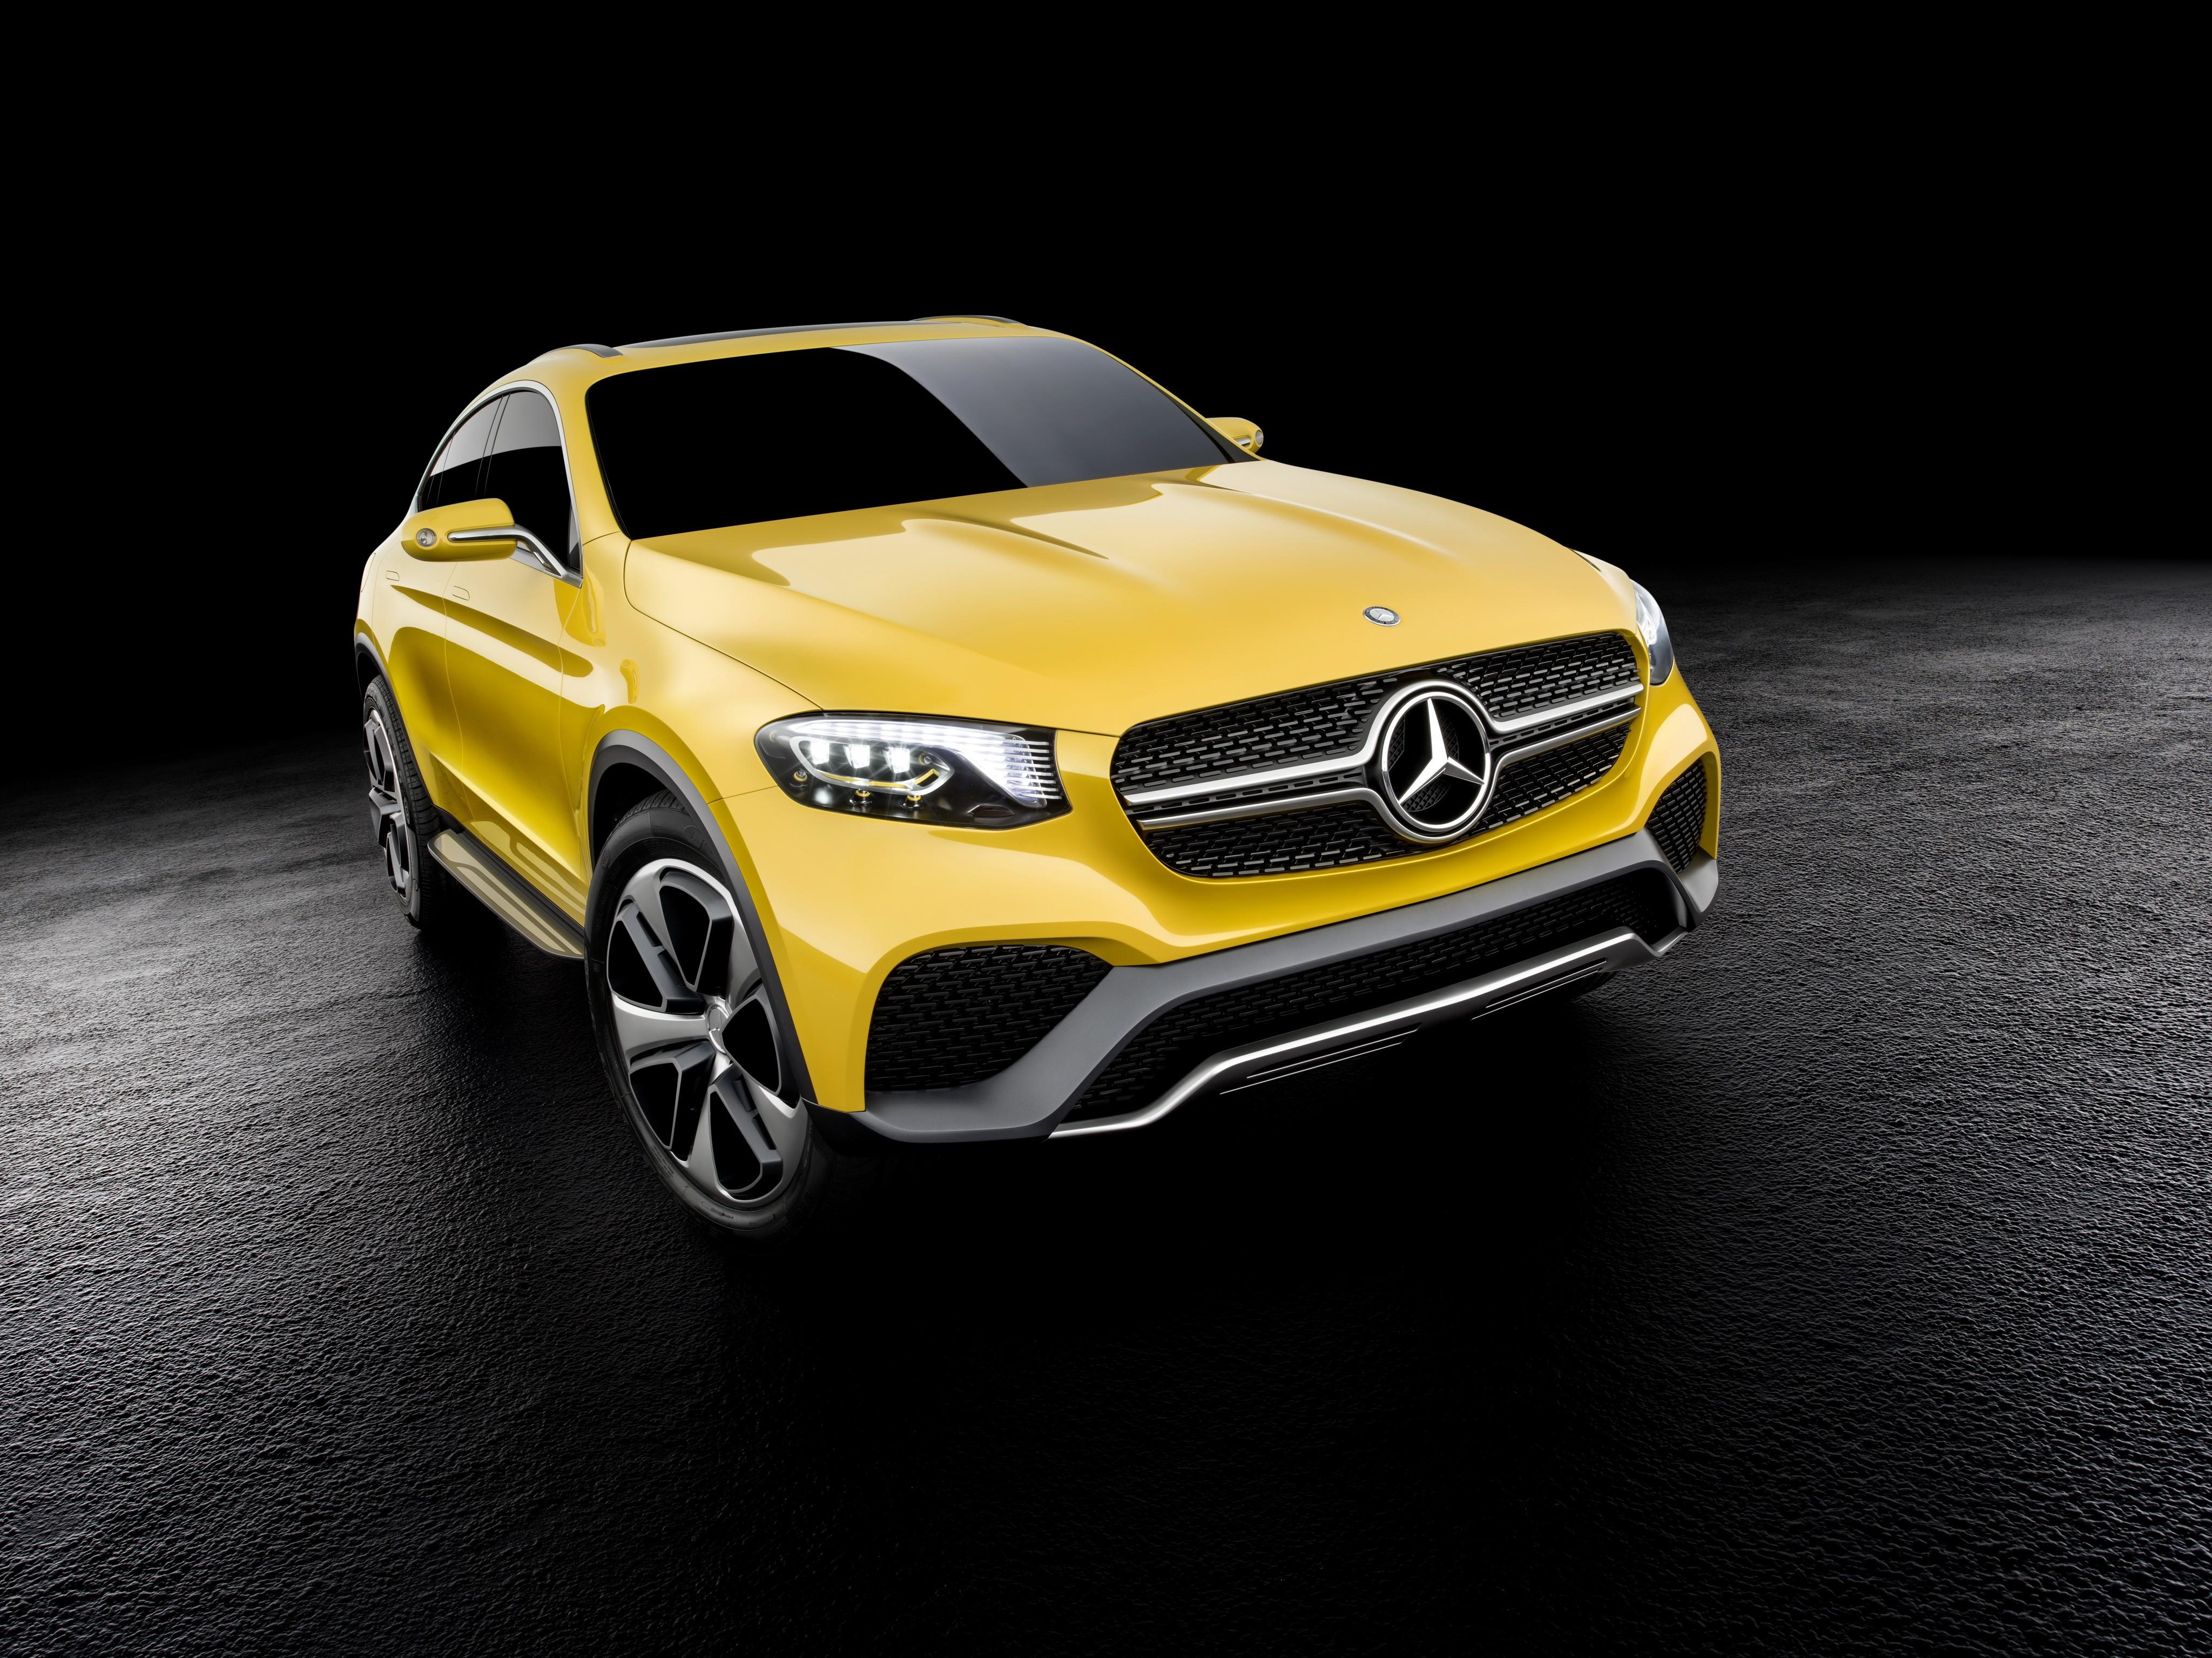 Wallpaper Mercedes-Benz GLC, concept, gold, Cars & Bikes #7685